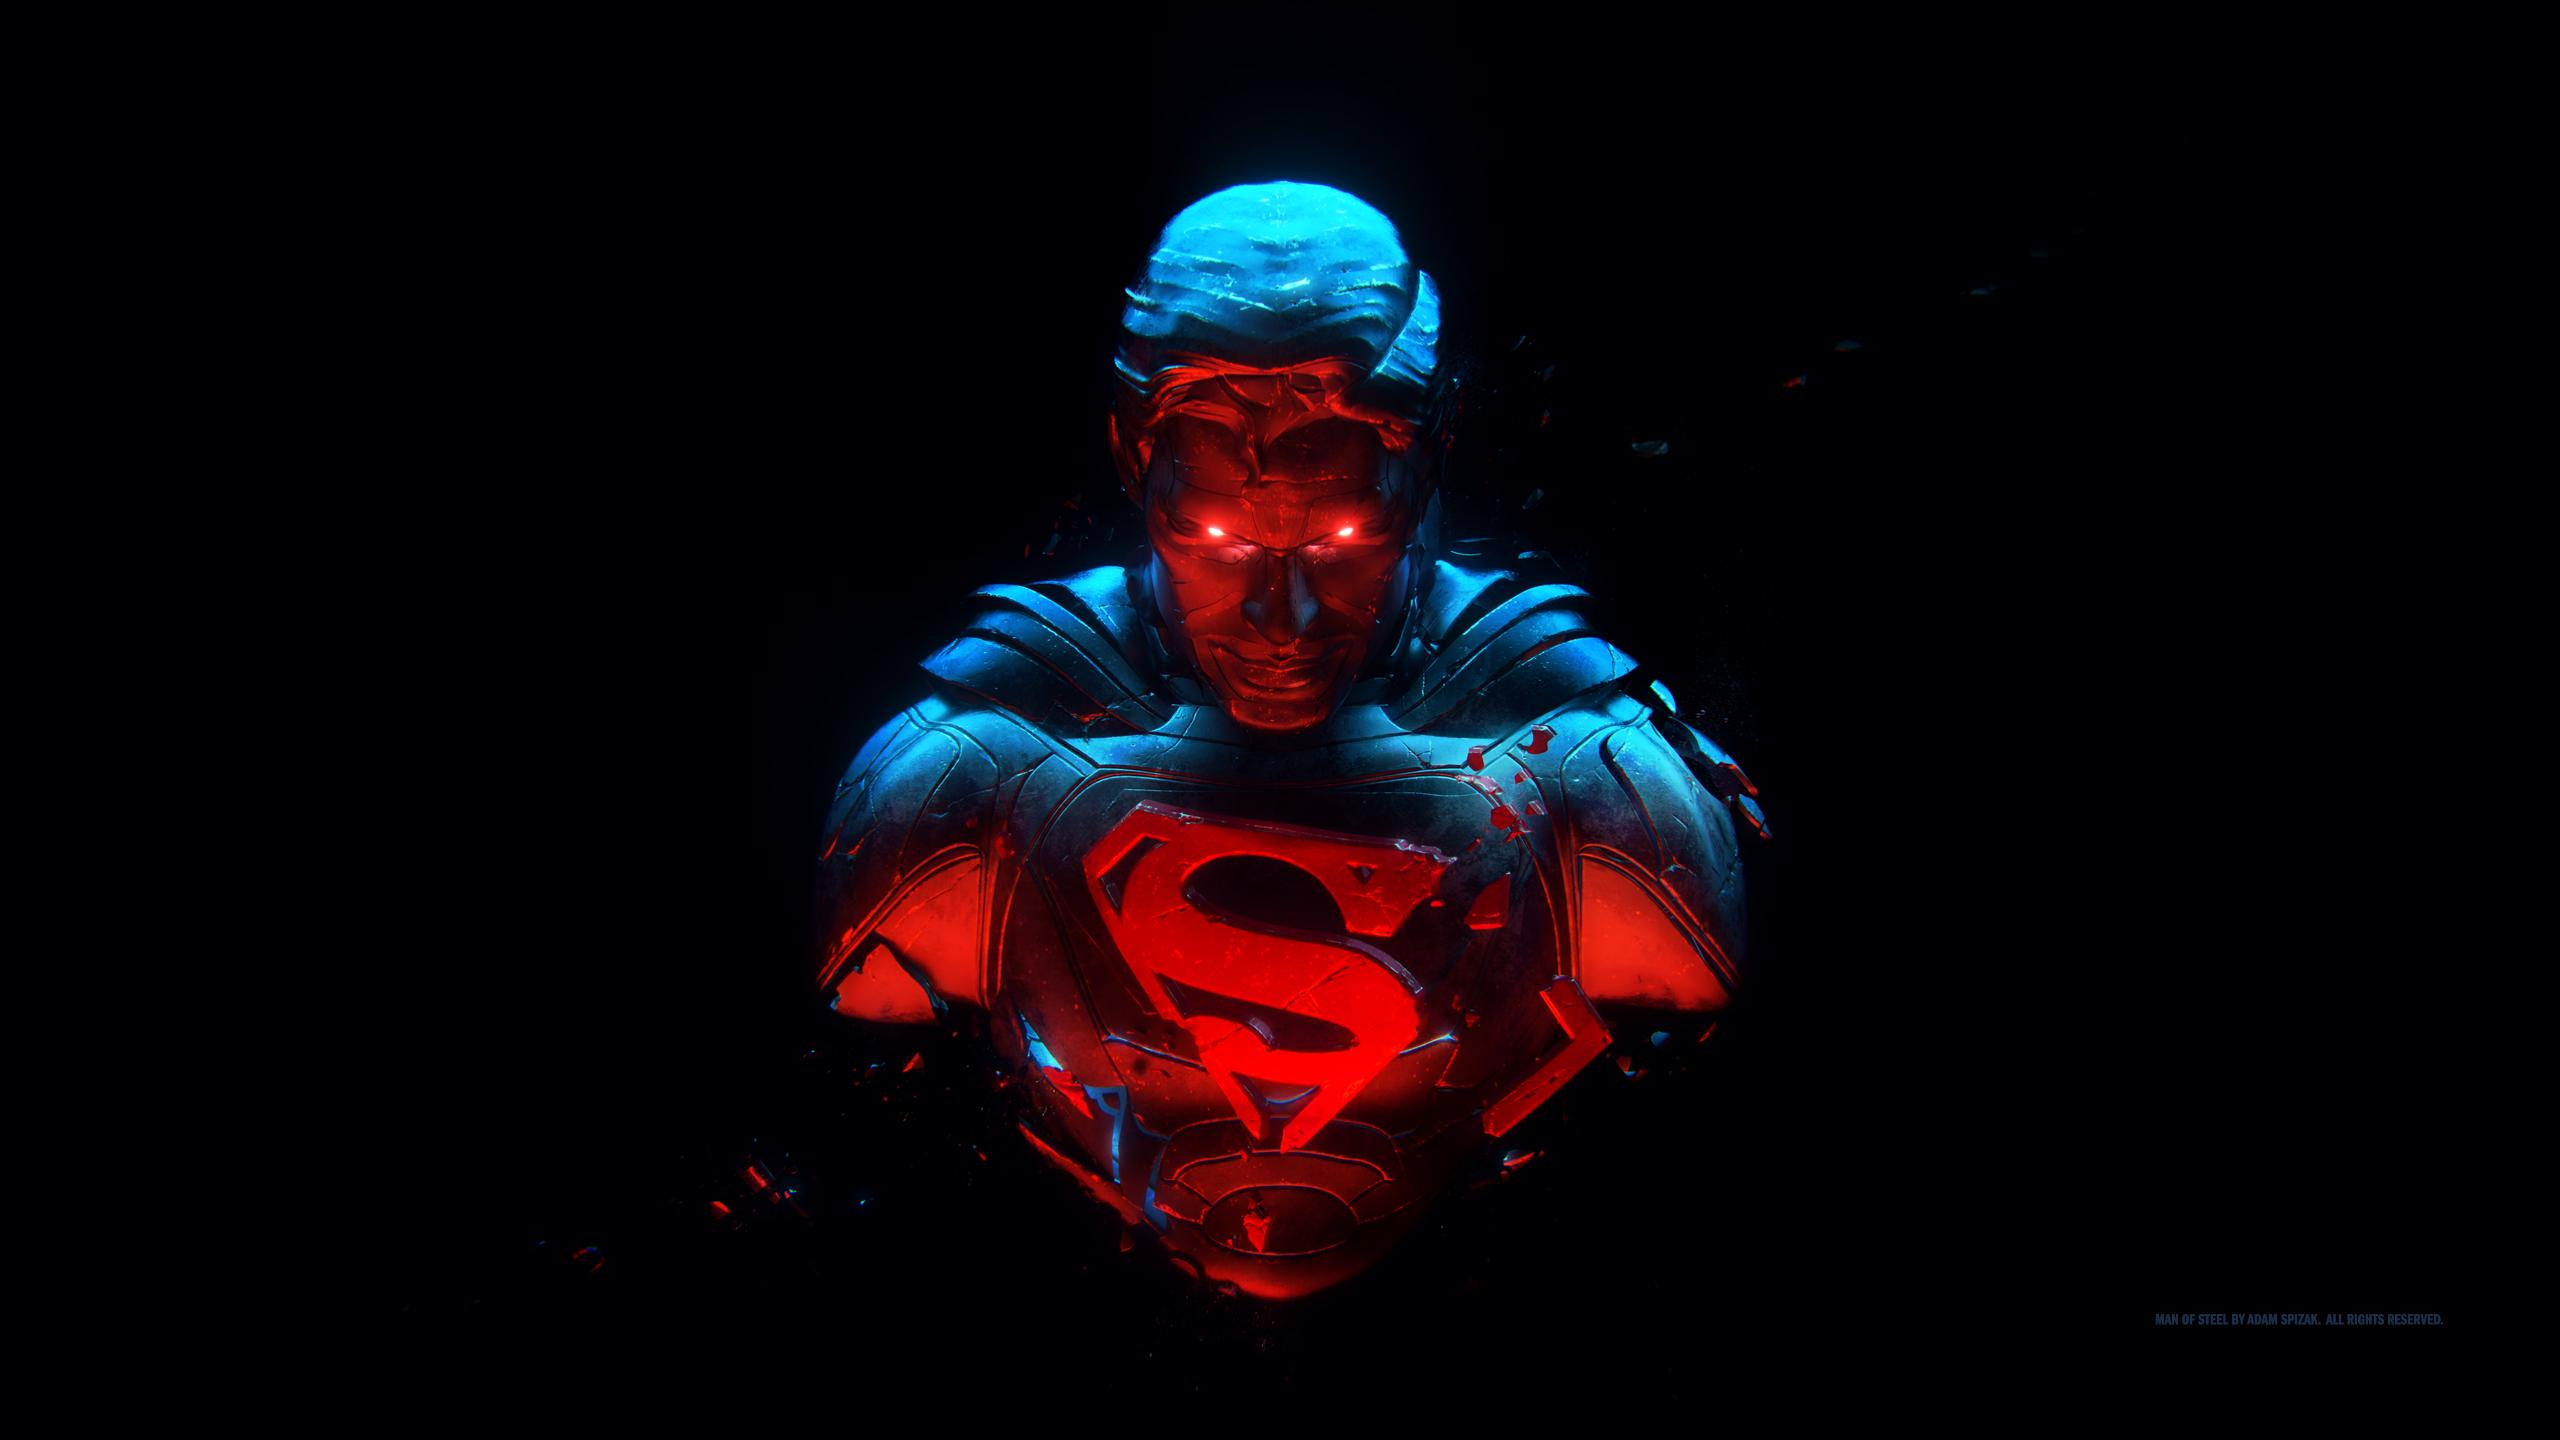 General 2560x1440 Superman Man of Steel DC Comics